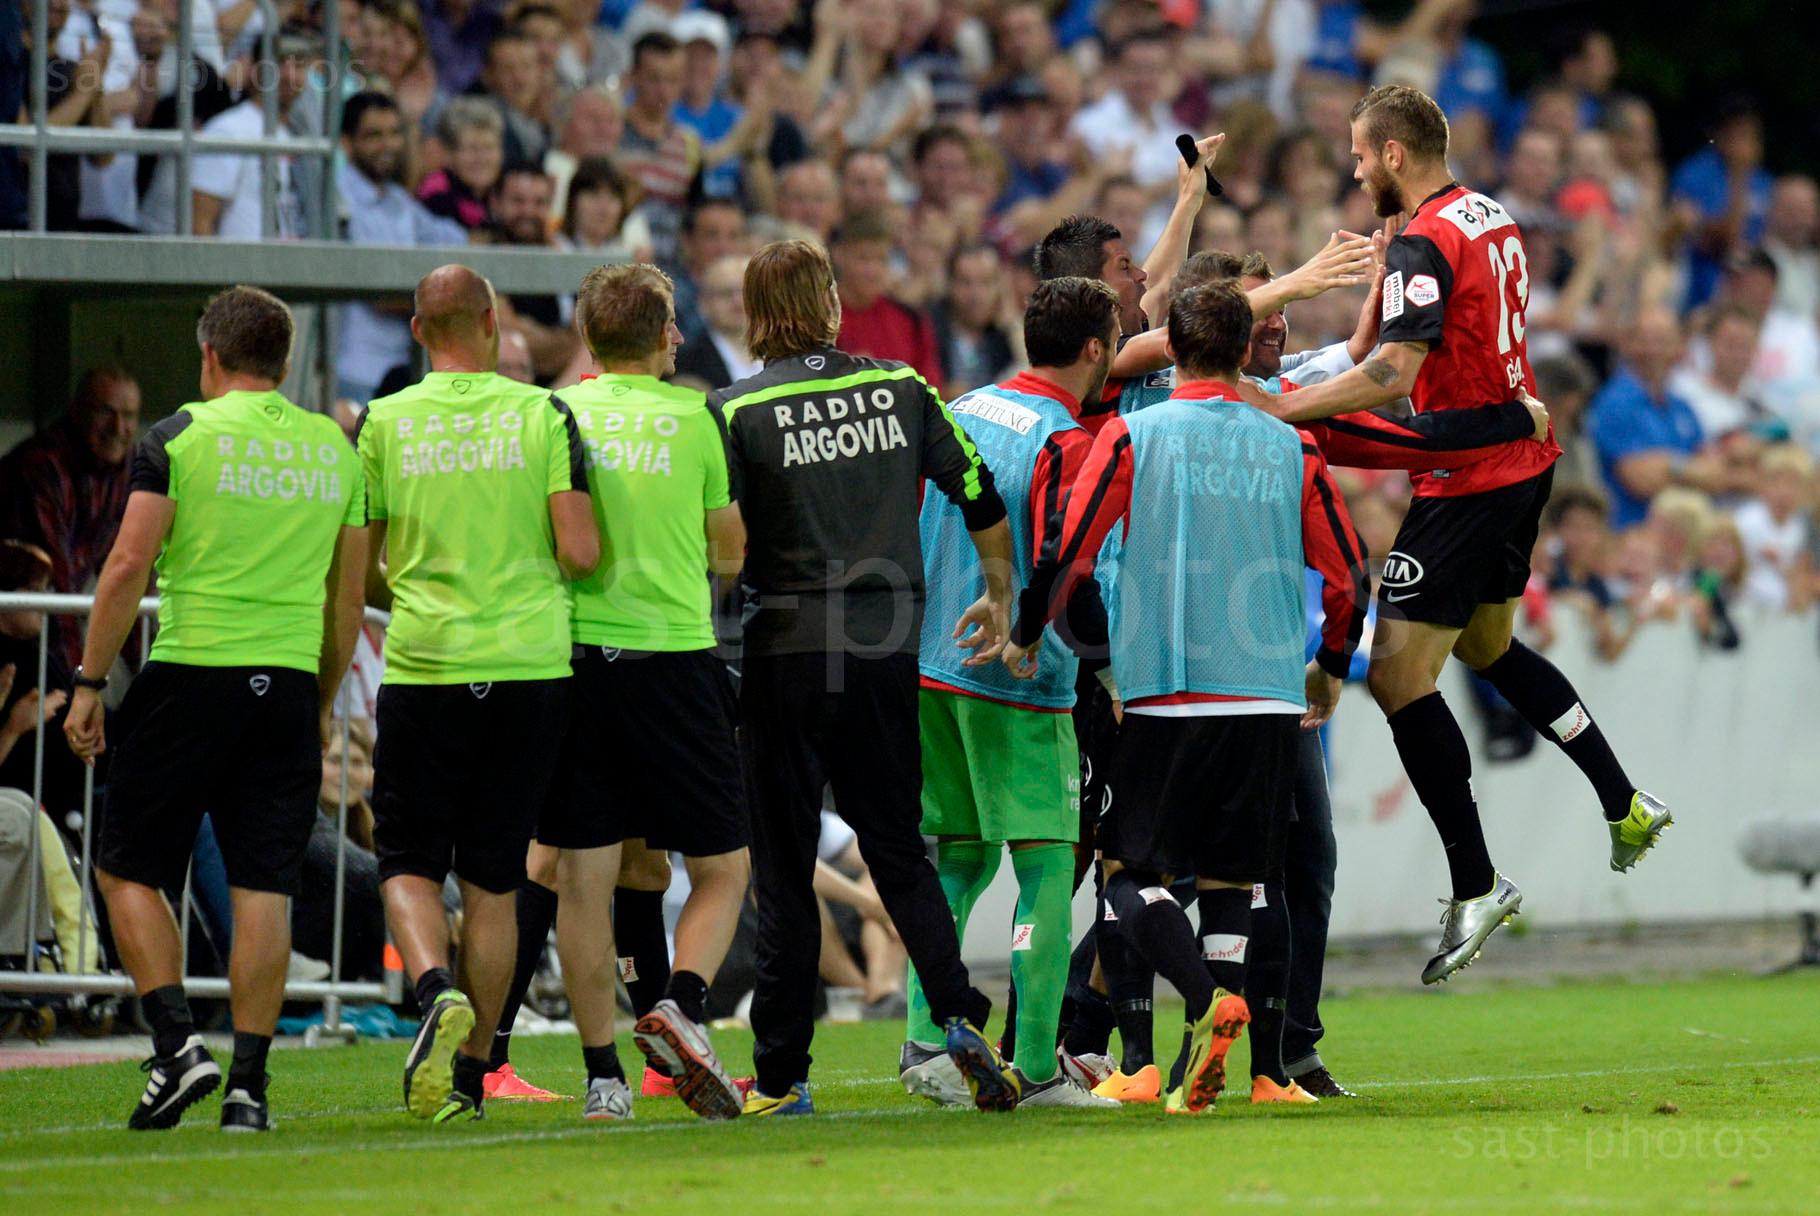 Torschuetze zum 1:0 fuer Aarau Edgars Gauracs (R. Aarau) jubelt mit den Mitspieler